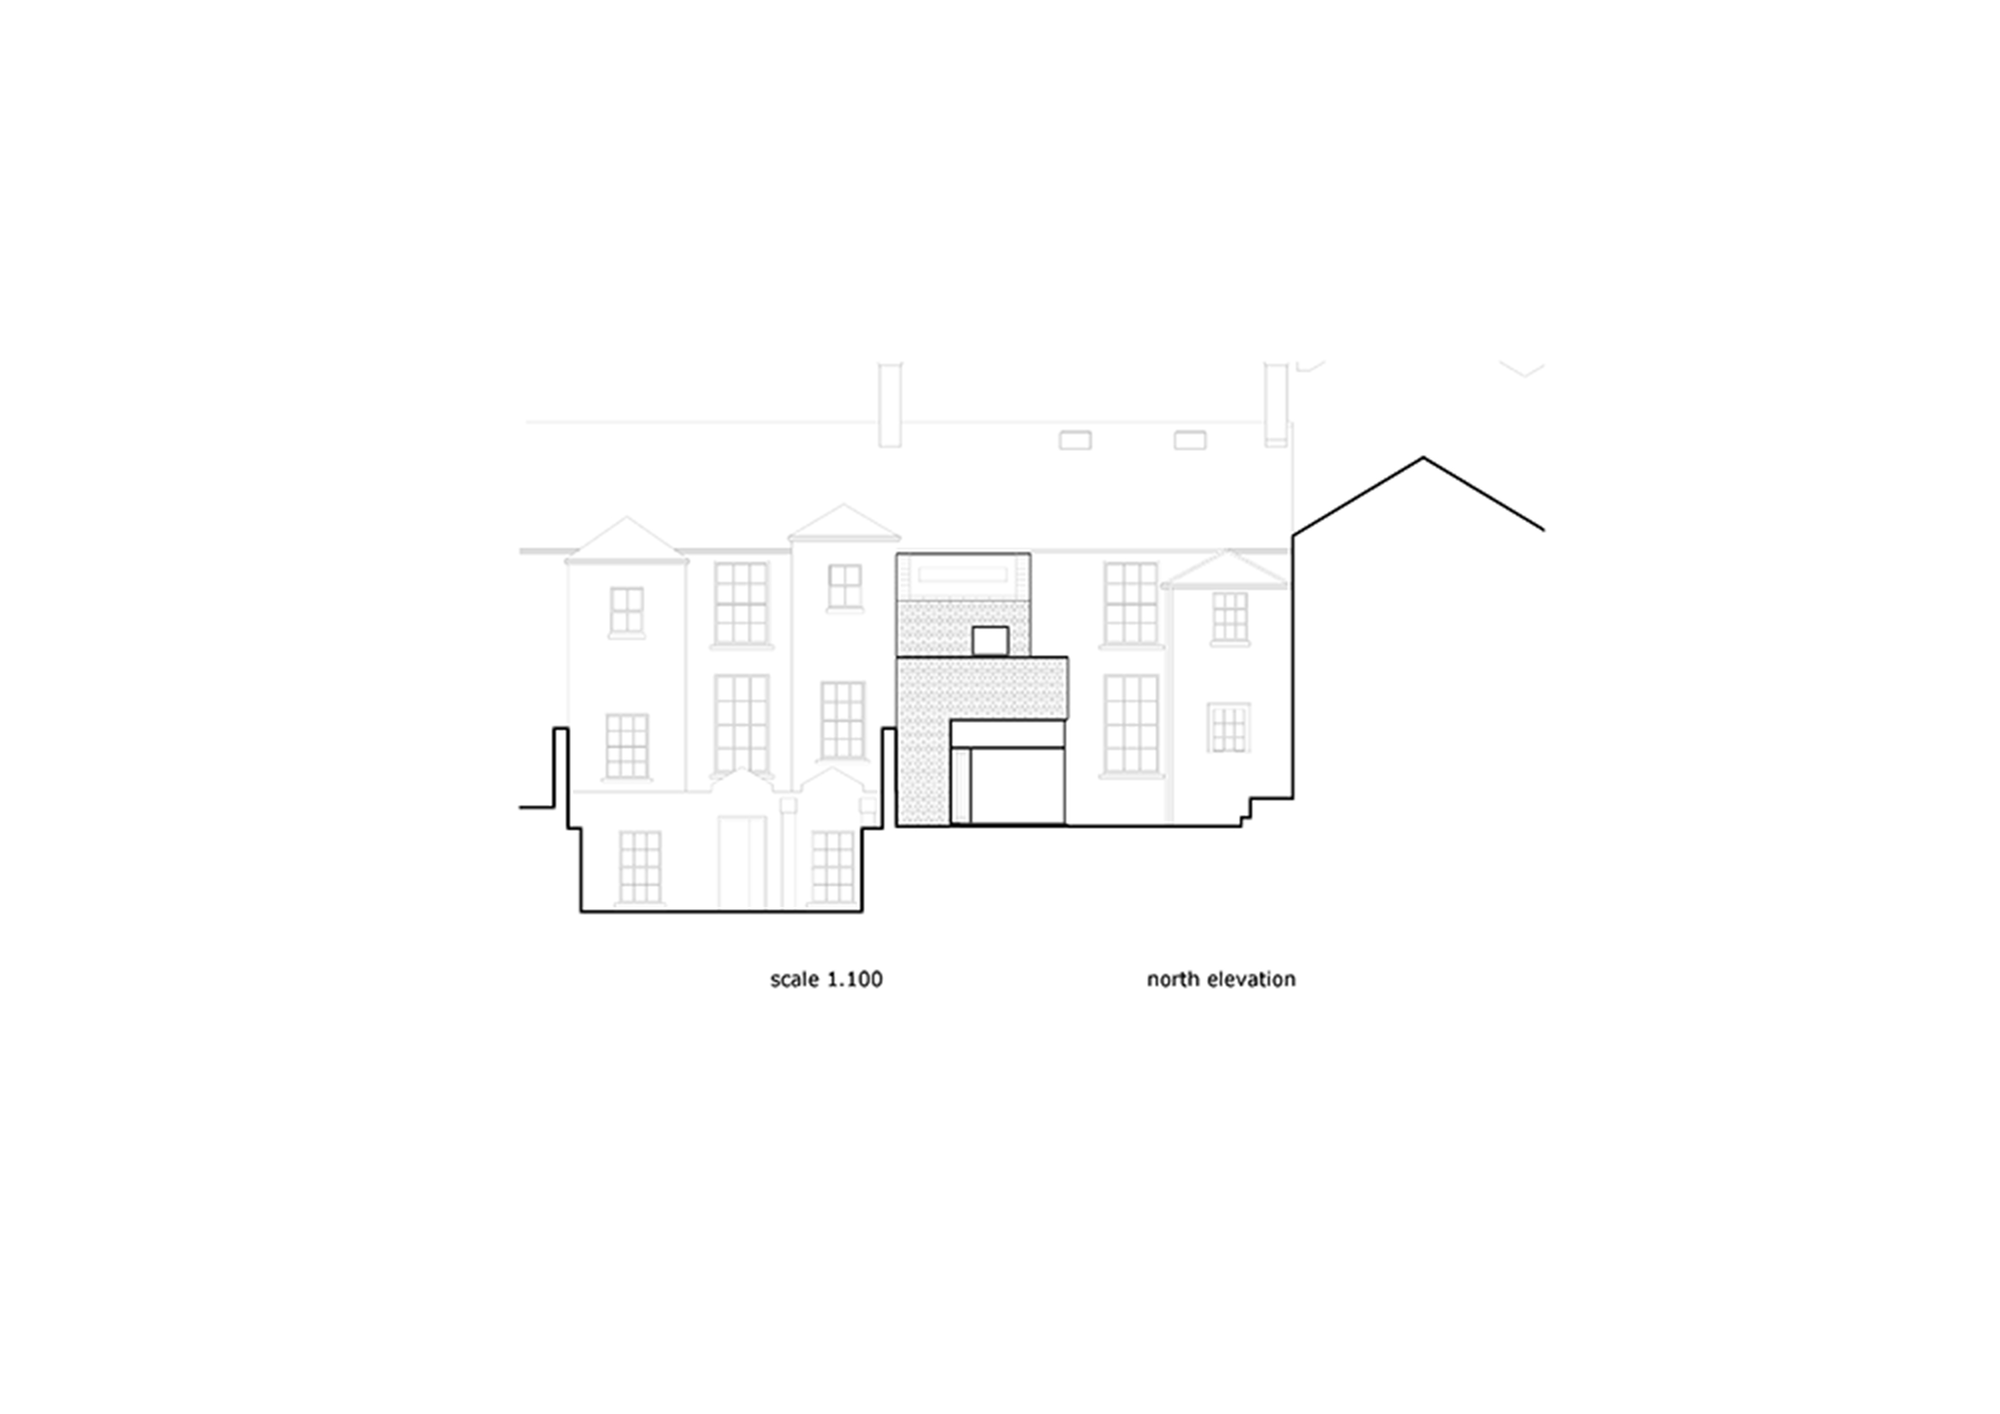 Brick_Addition-NOJI_Architects-12.png